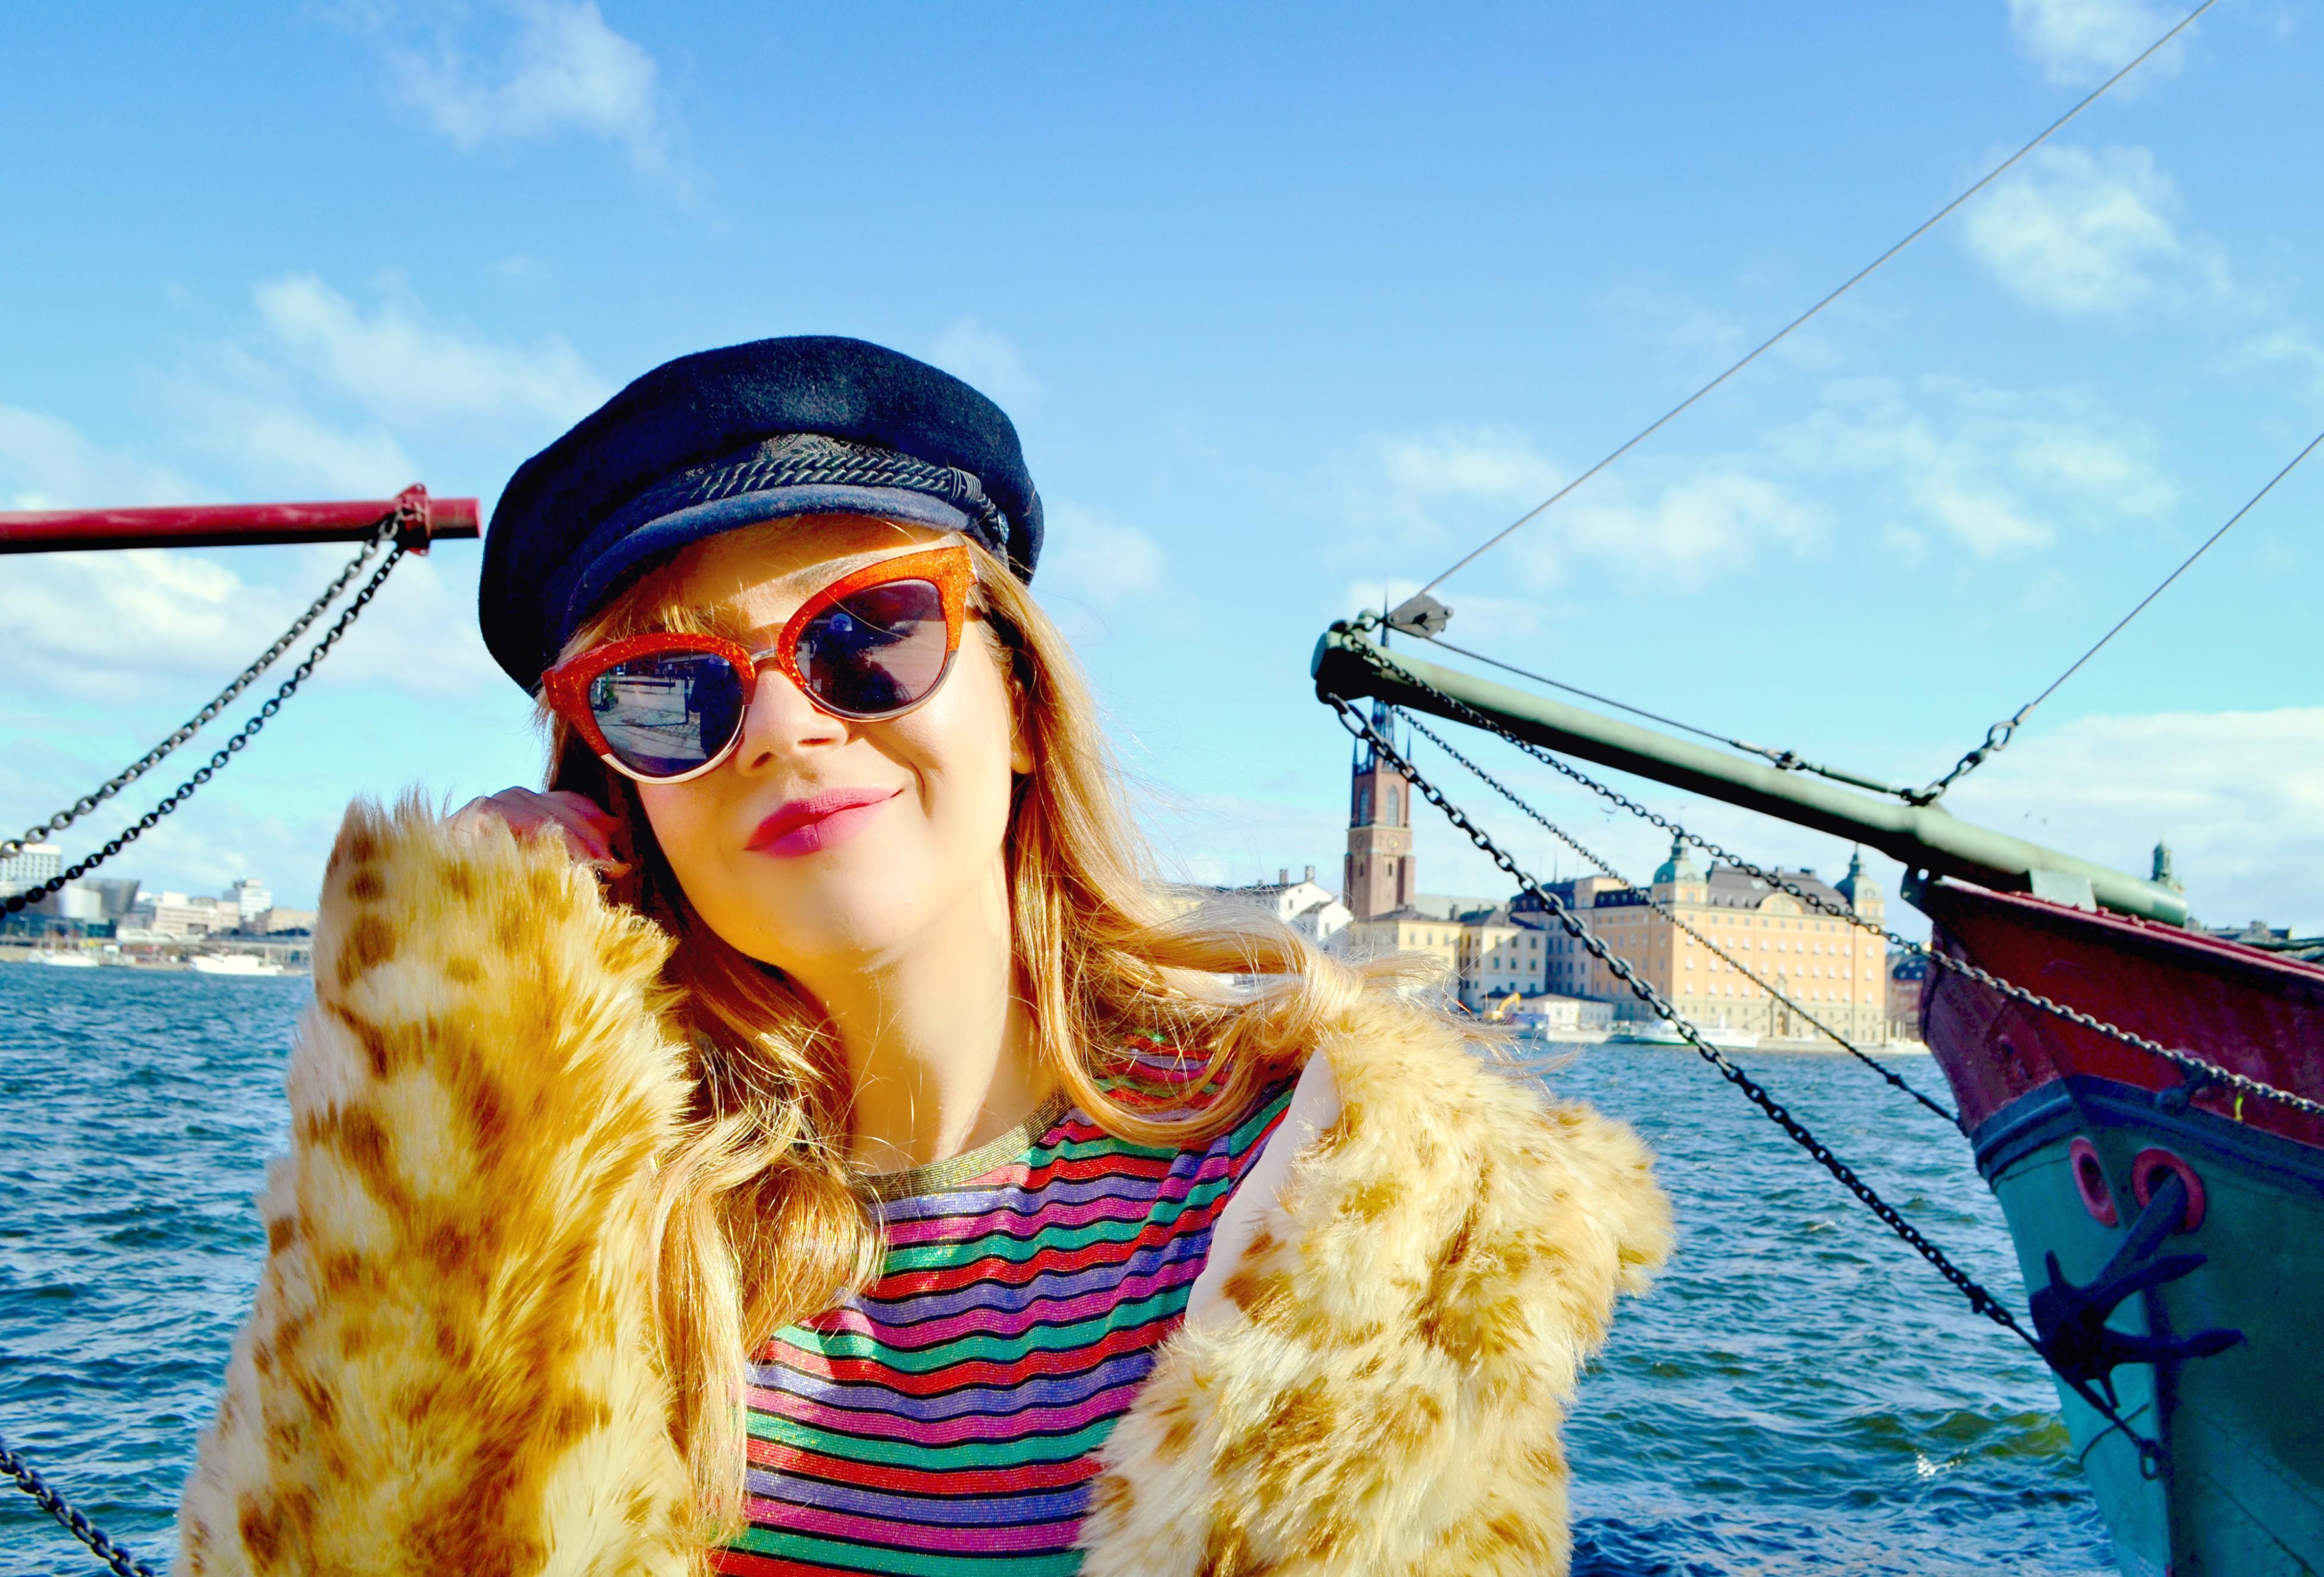 Blog-de-moda-ChicAdicta-influencer-Chic-Adicta-fashion-travel-look-con-rayas-leopard-print-PiensaenChic-Piensa-en-Chic